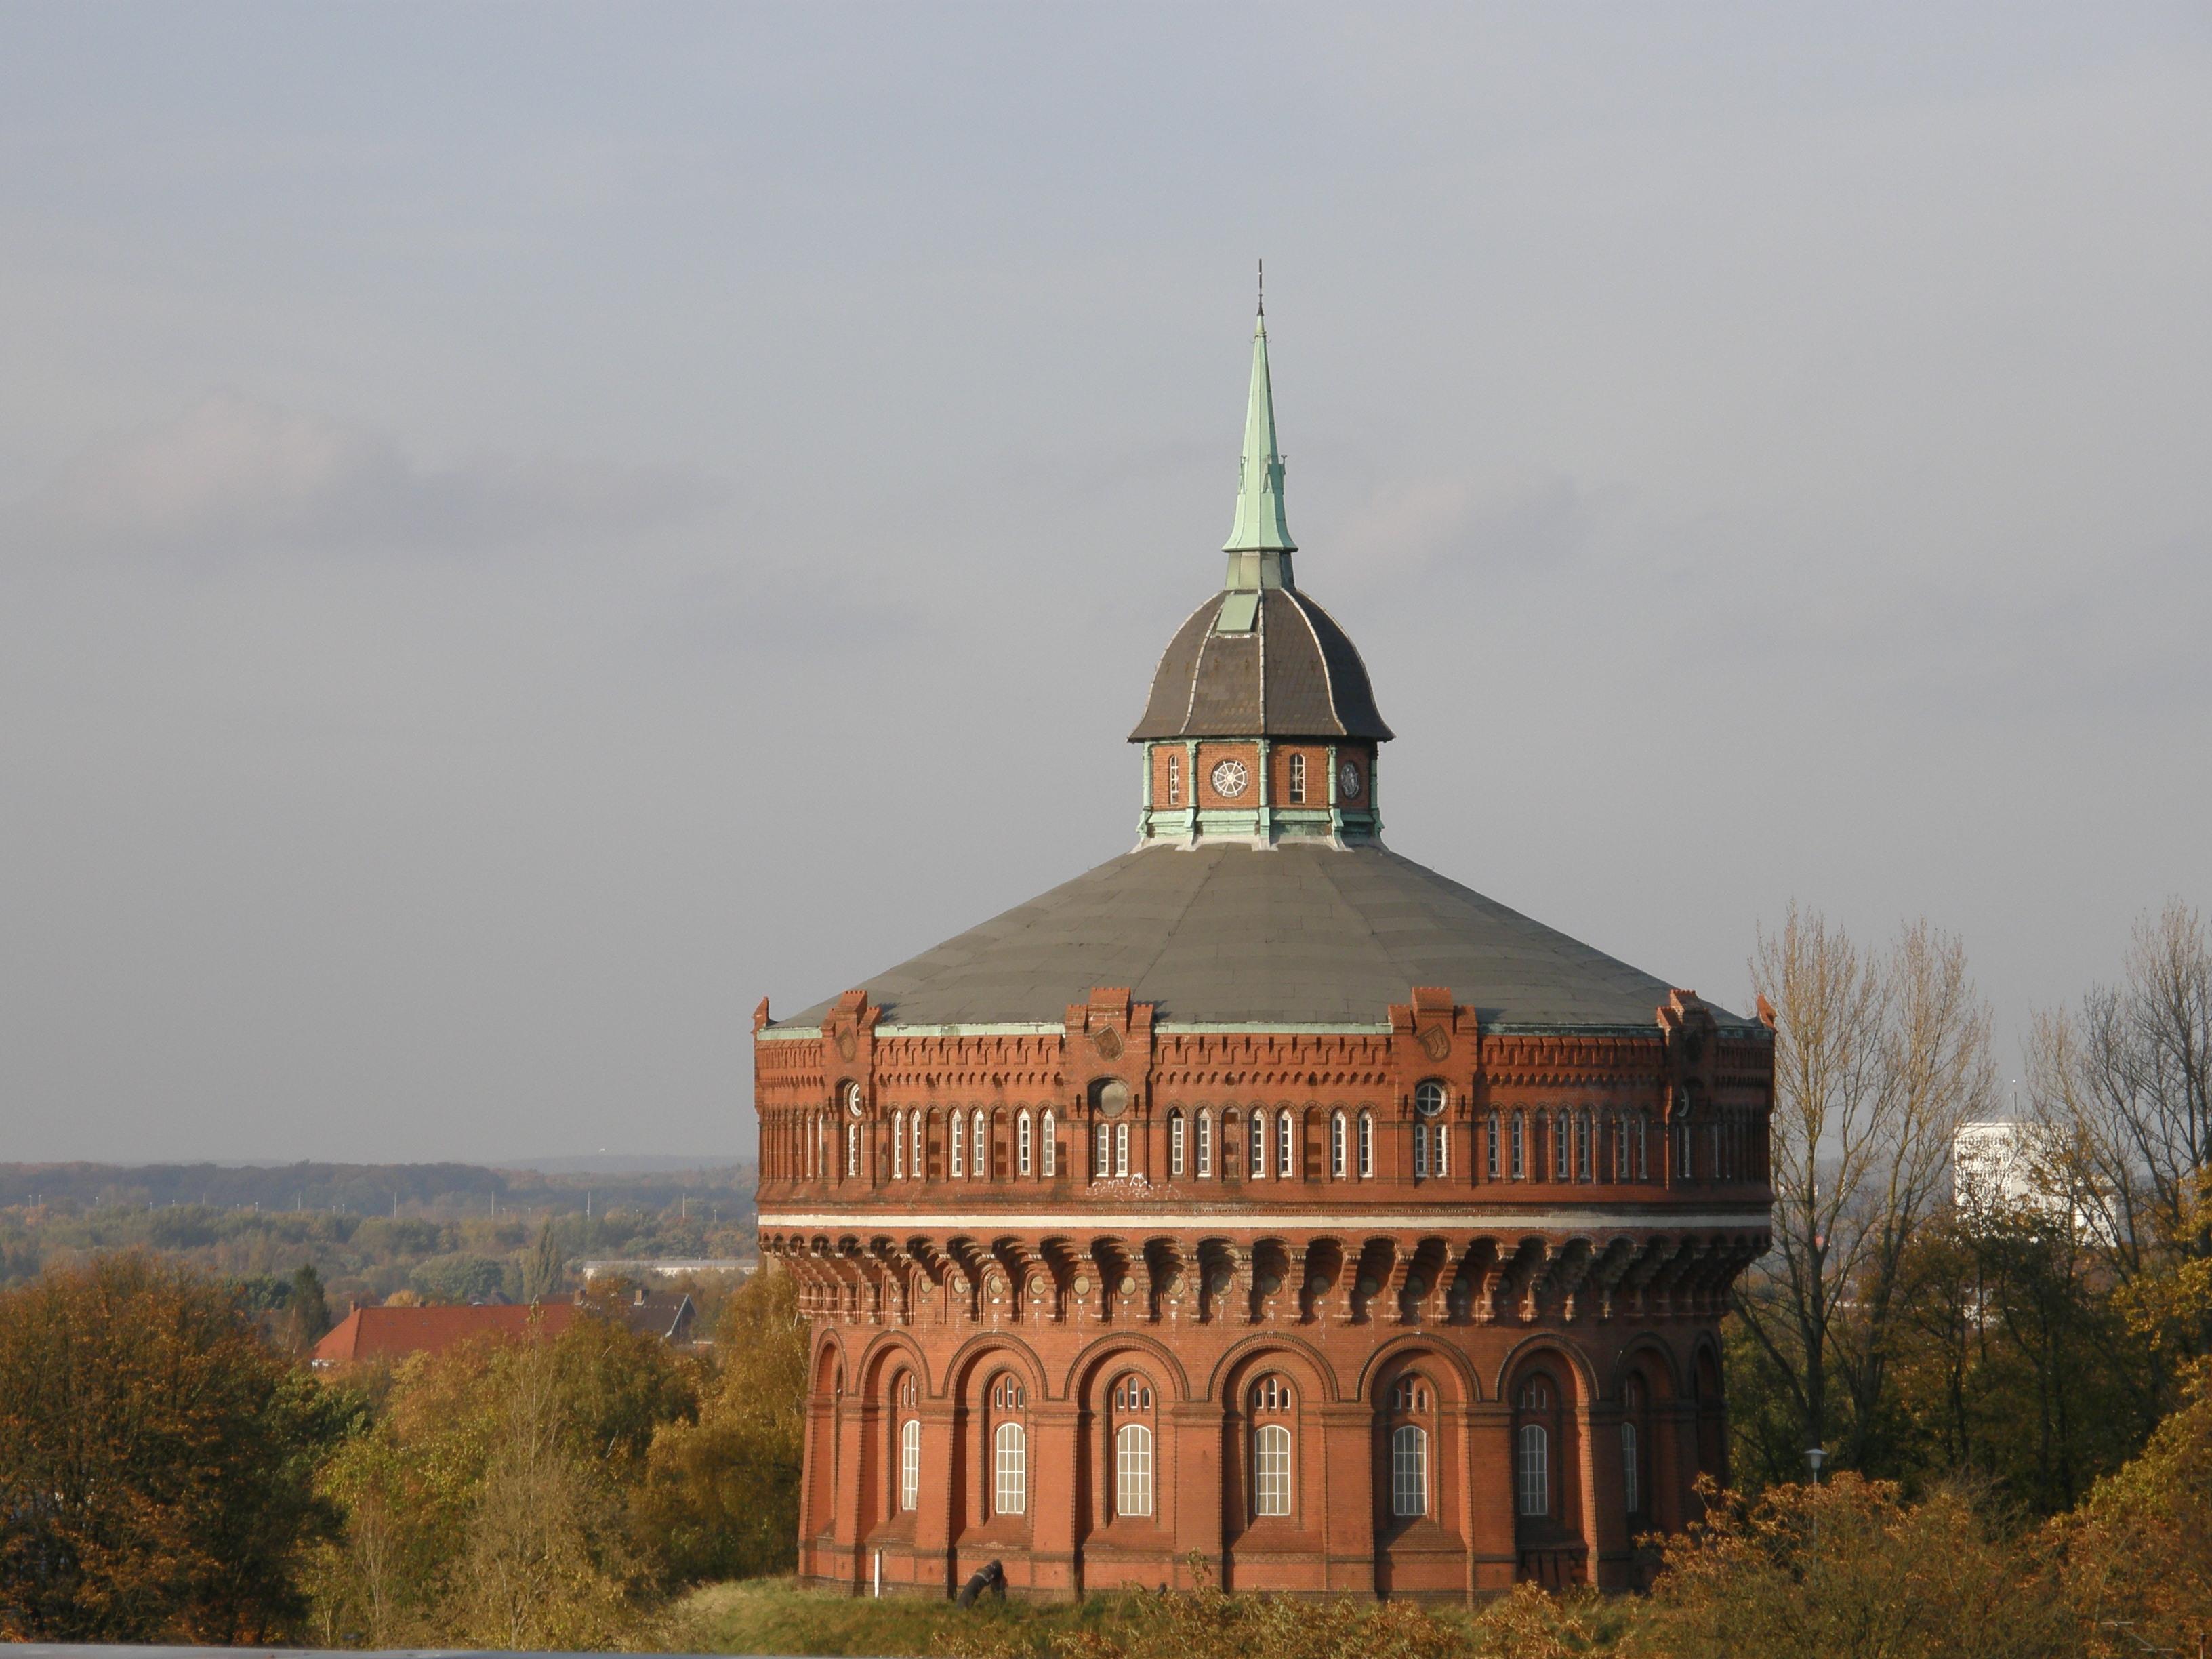 Wasserturm Ravensberg